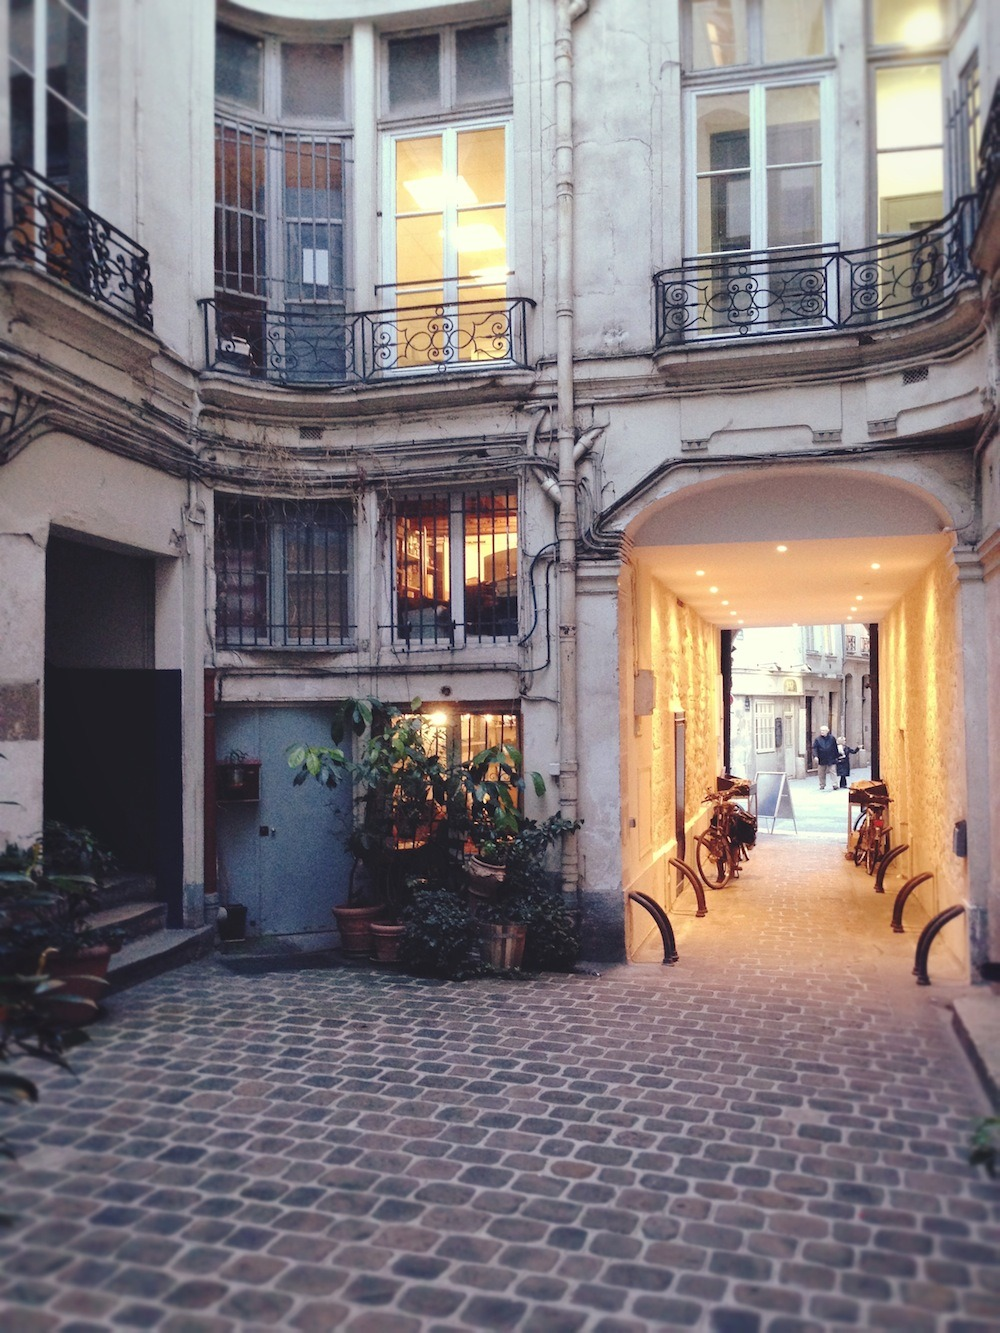 lemme-holla-at-you:  vacilandoelmundo:  Paris, France   Xoxo